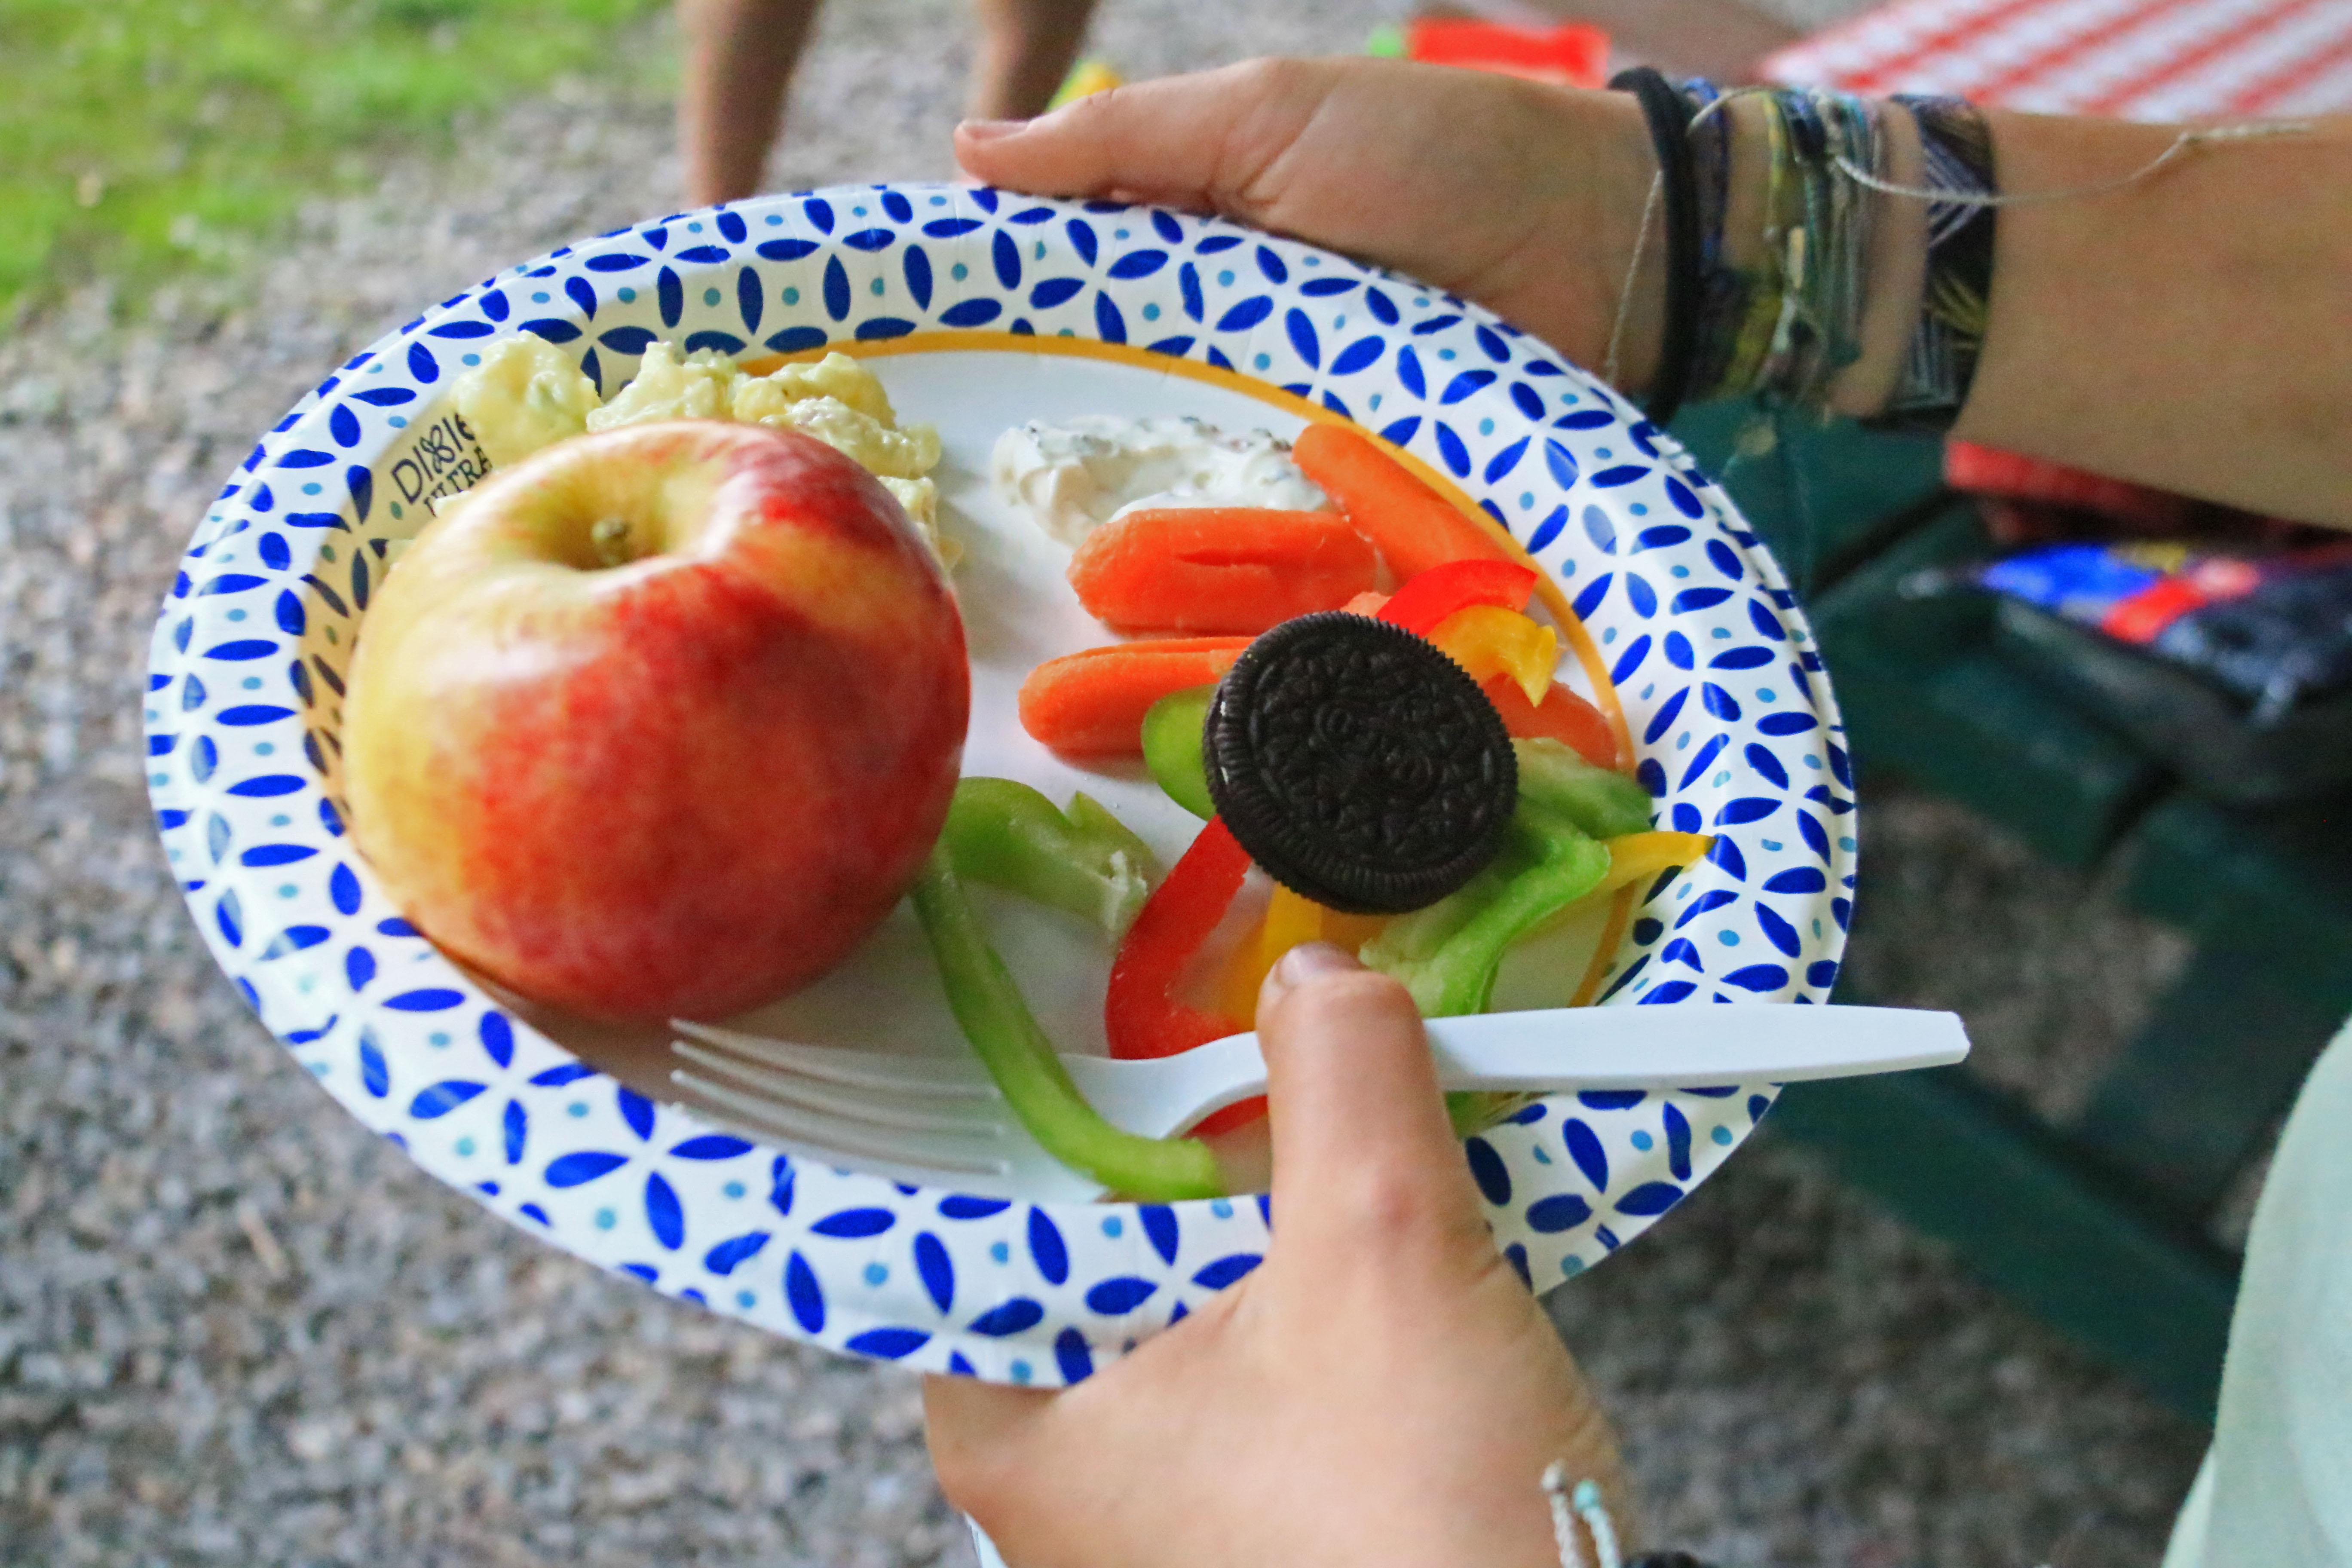 22 Basic Food Groups